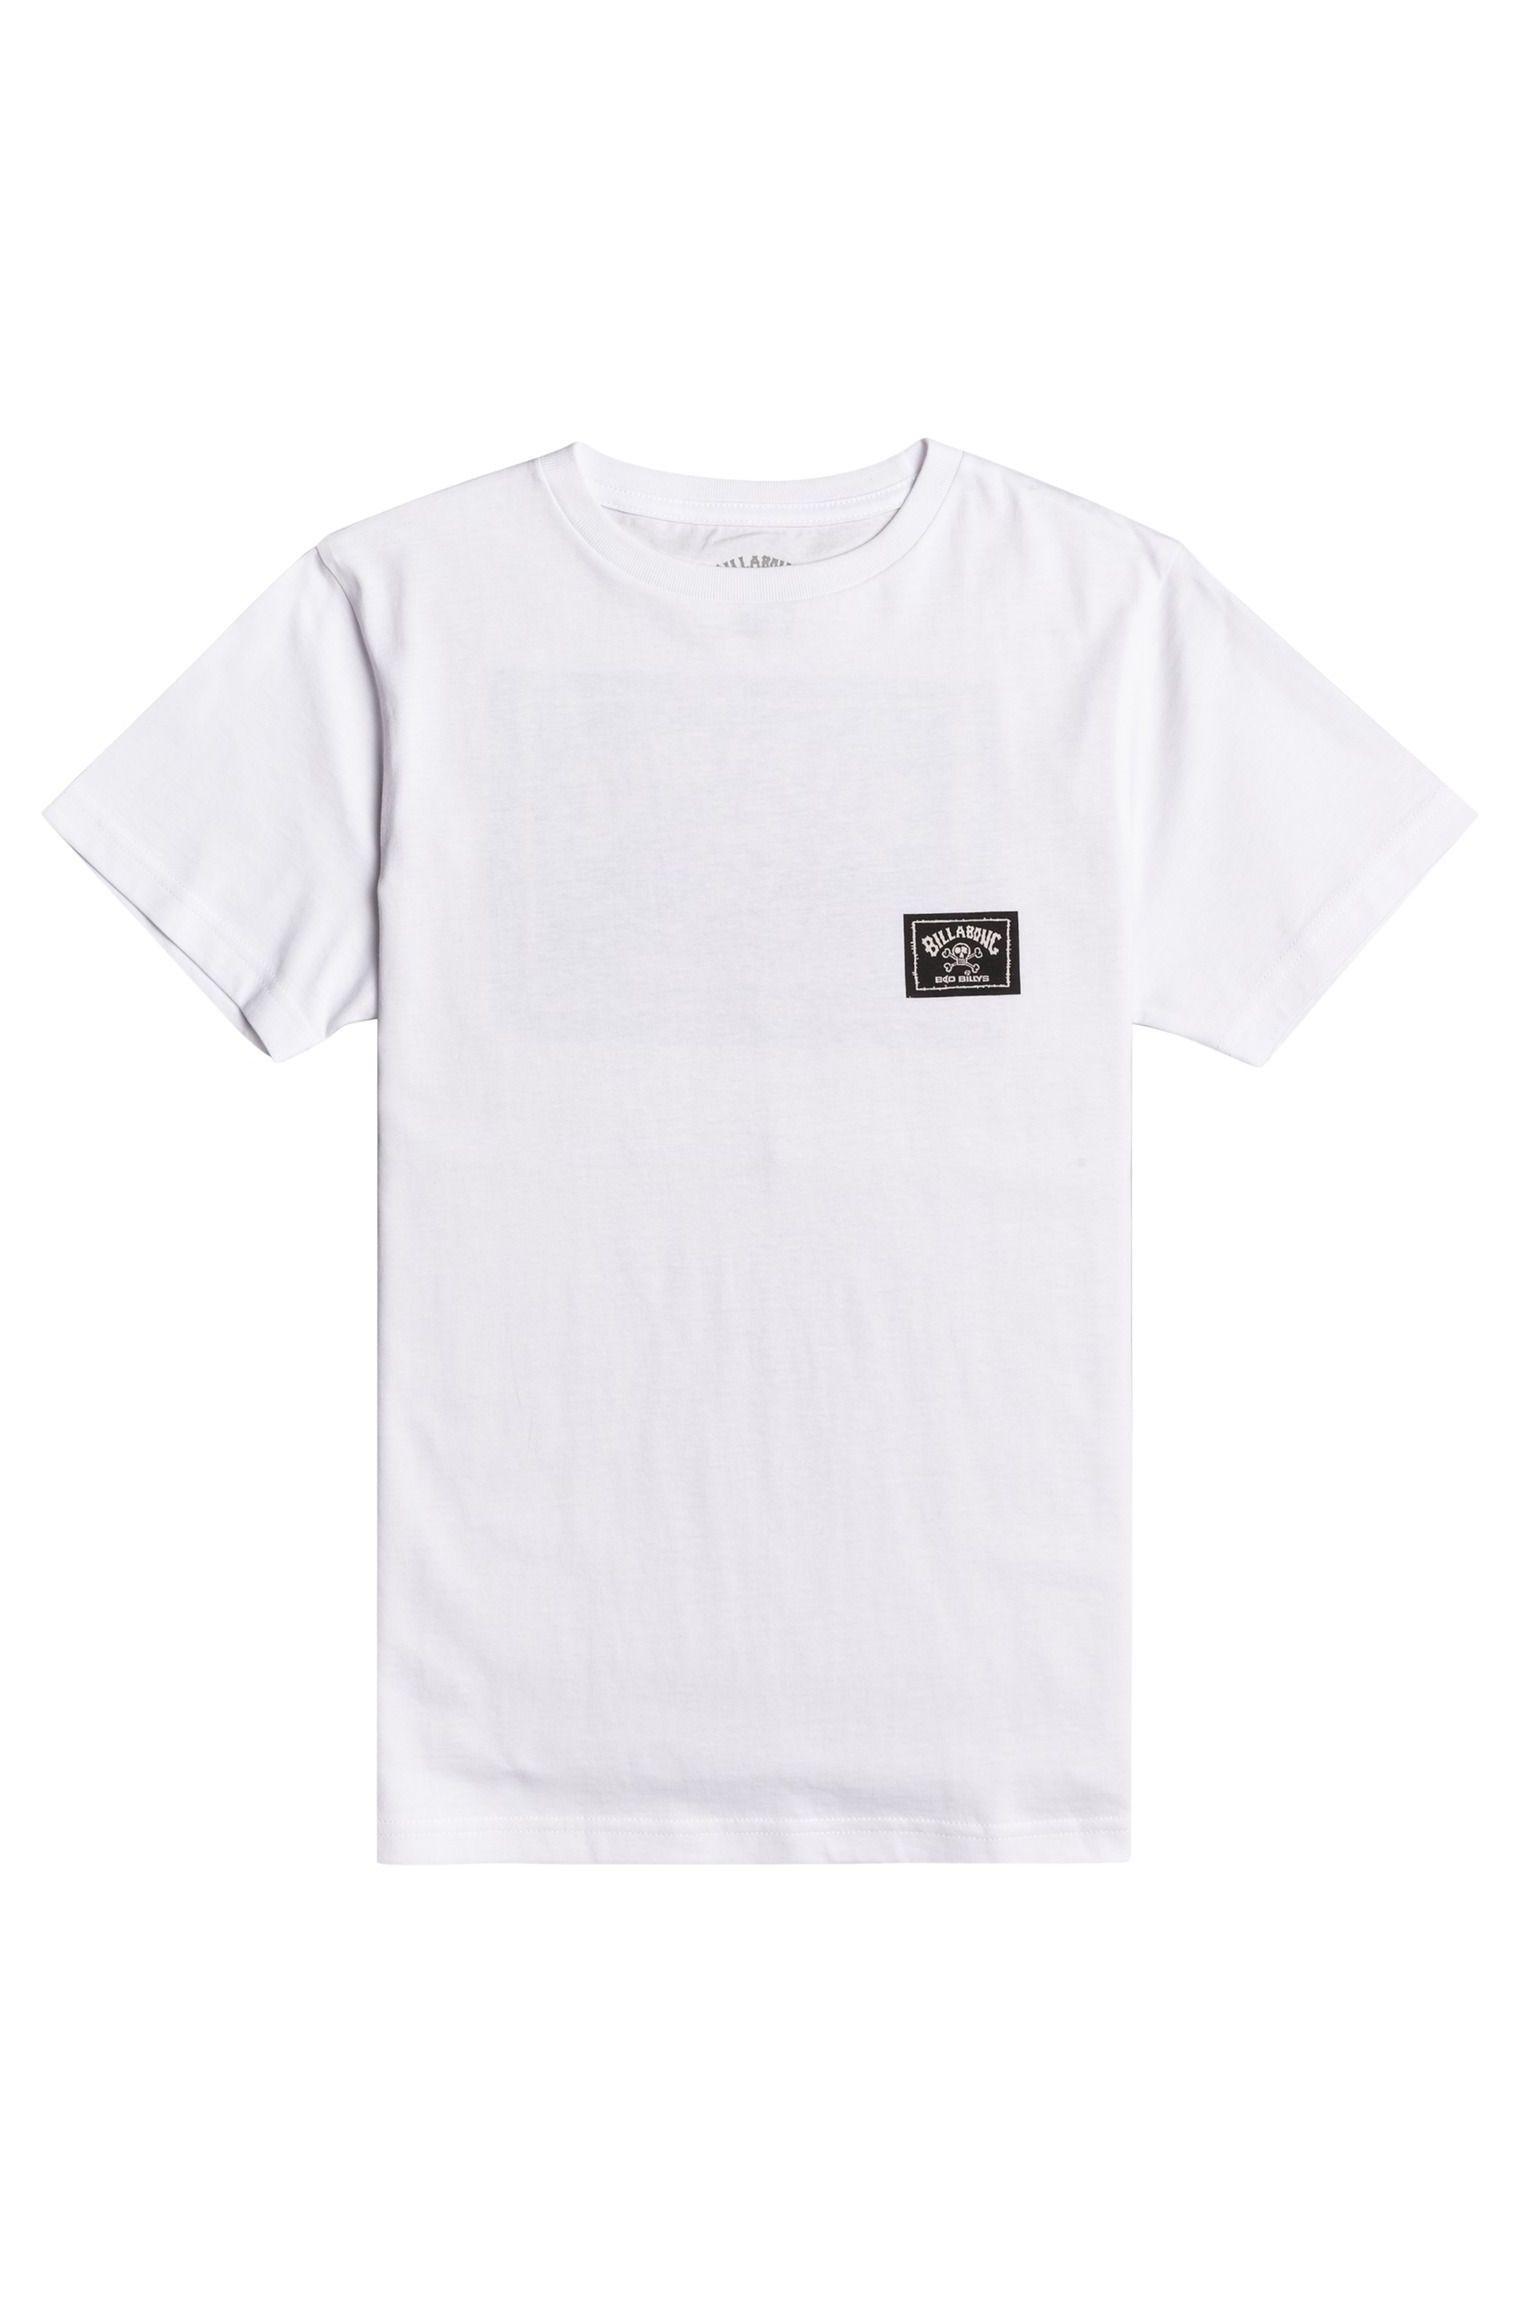 T-Shirt Billabong BAD BILLY ARCH SS BO SEASONAL COLLECTION White